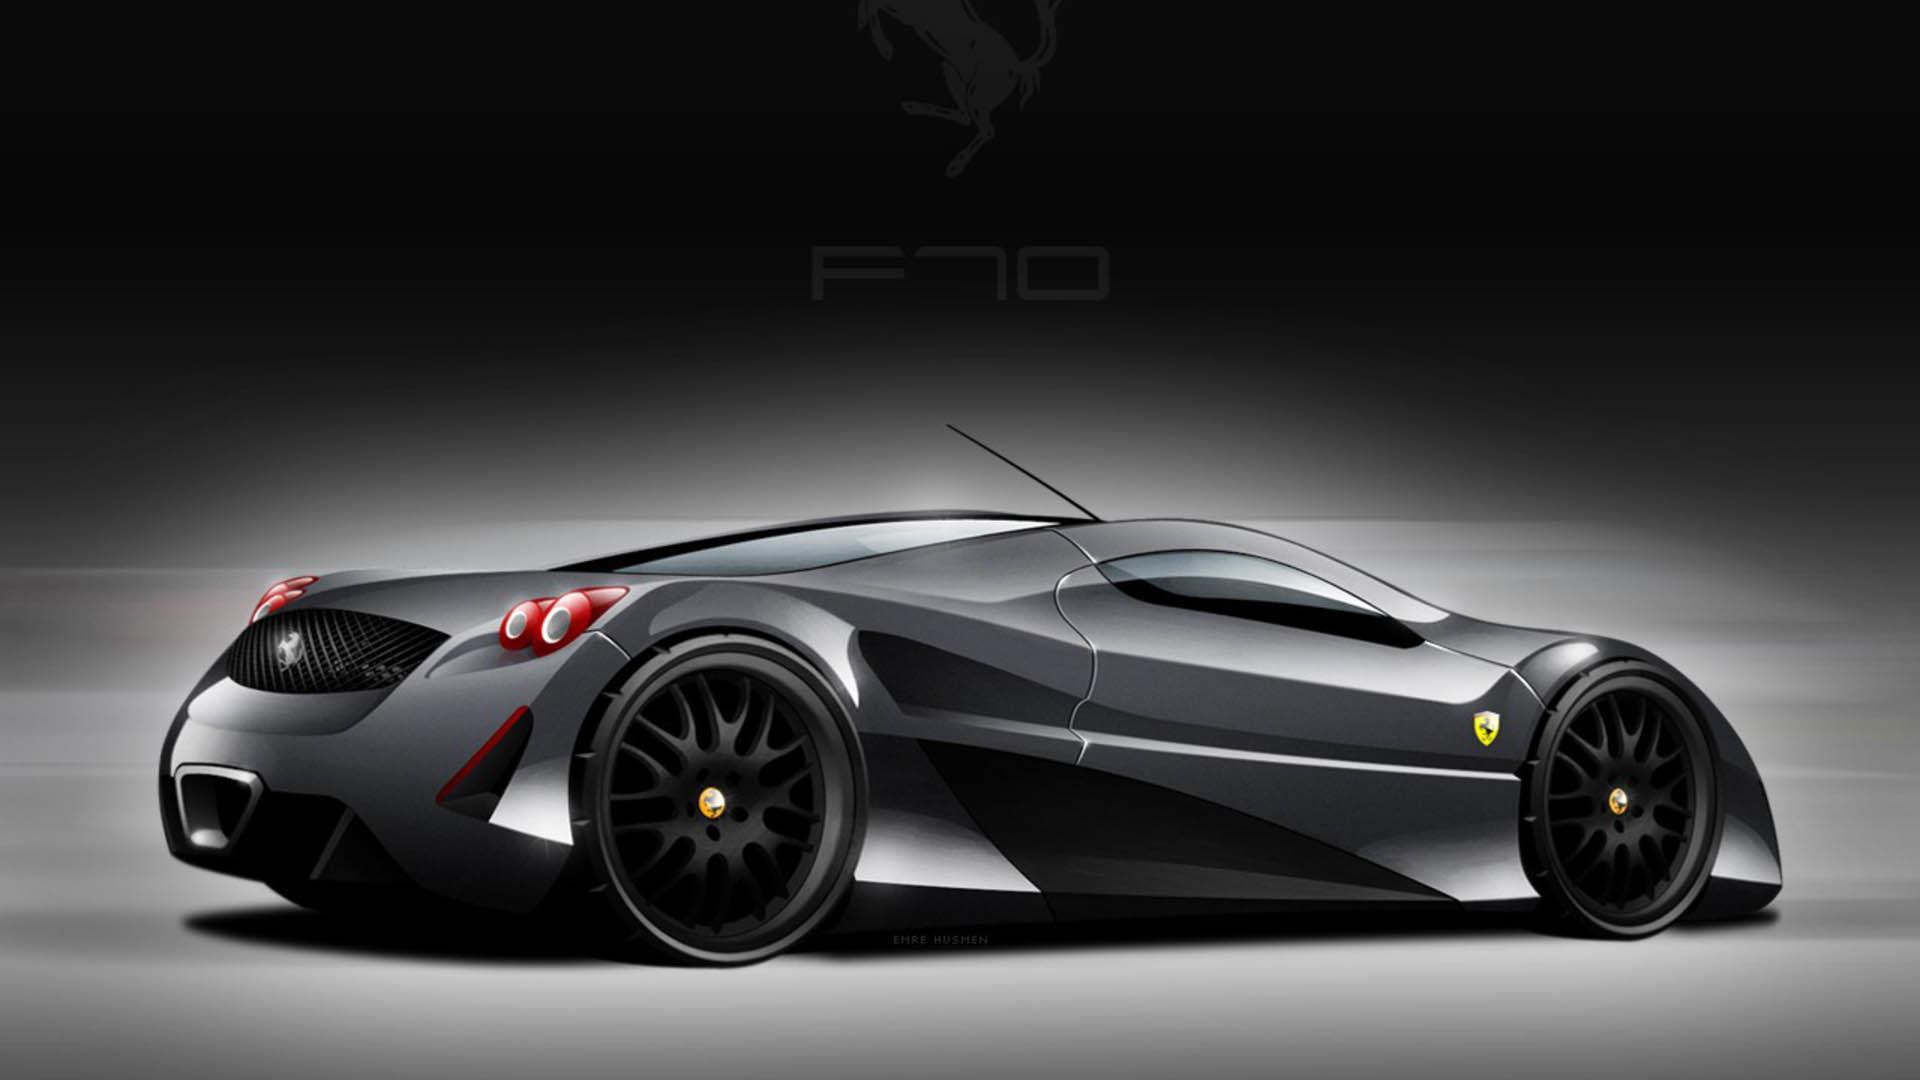 Res: 1920x1080, Black Ferrari Cars Wallpapers Group (64+)